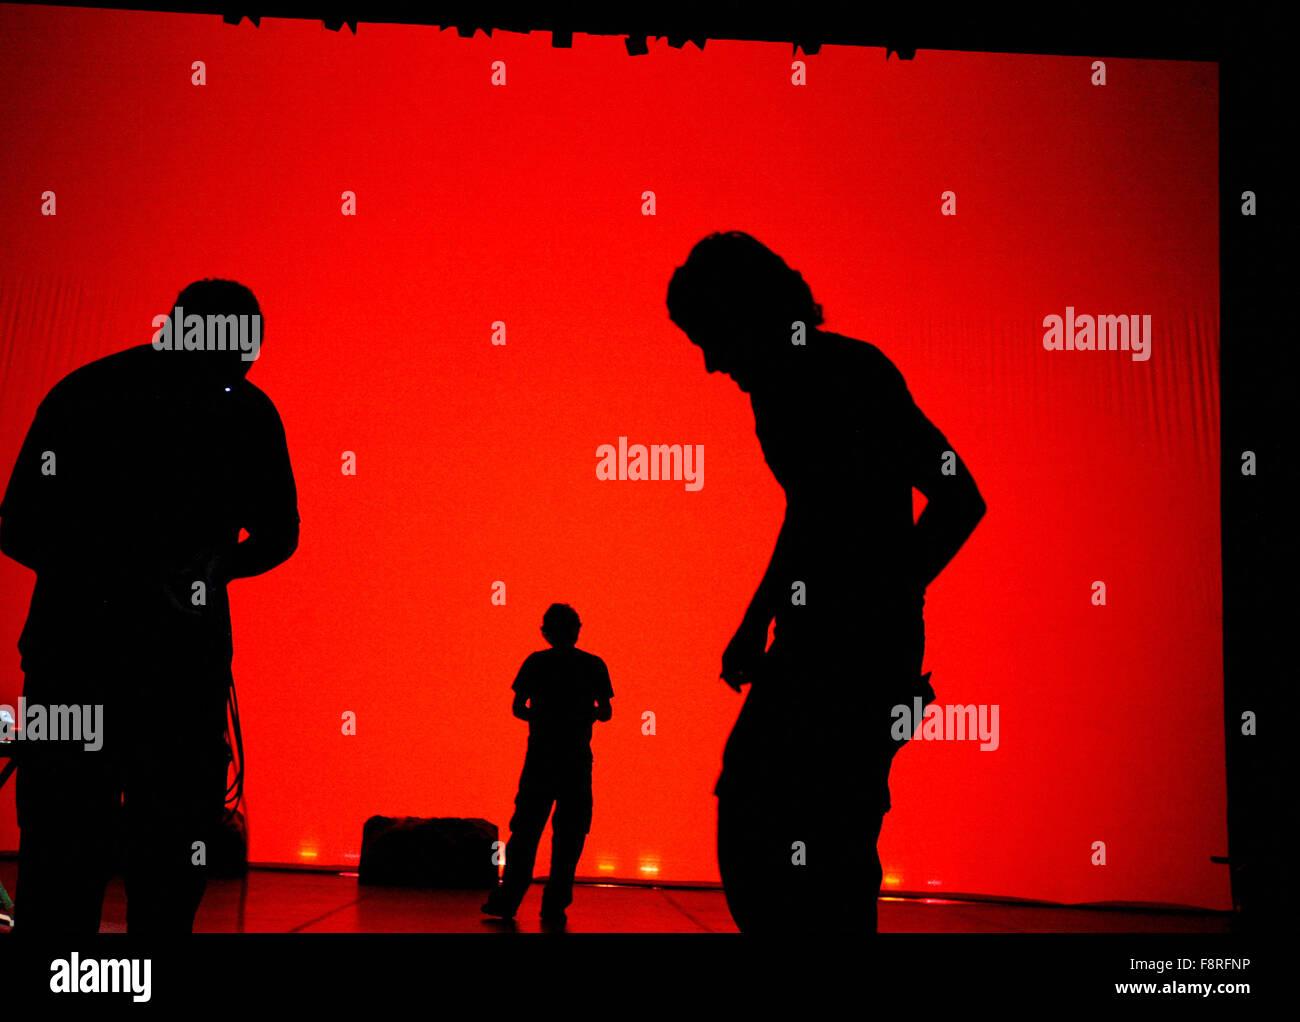 Silhouettes © Miguel Gomez - Stock Image